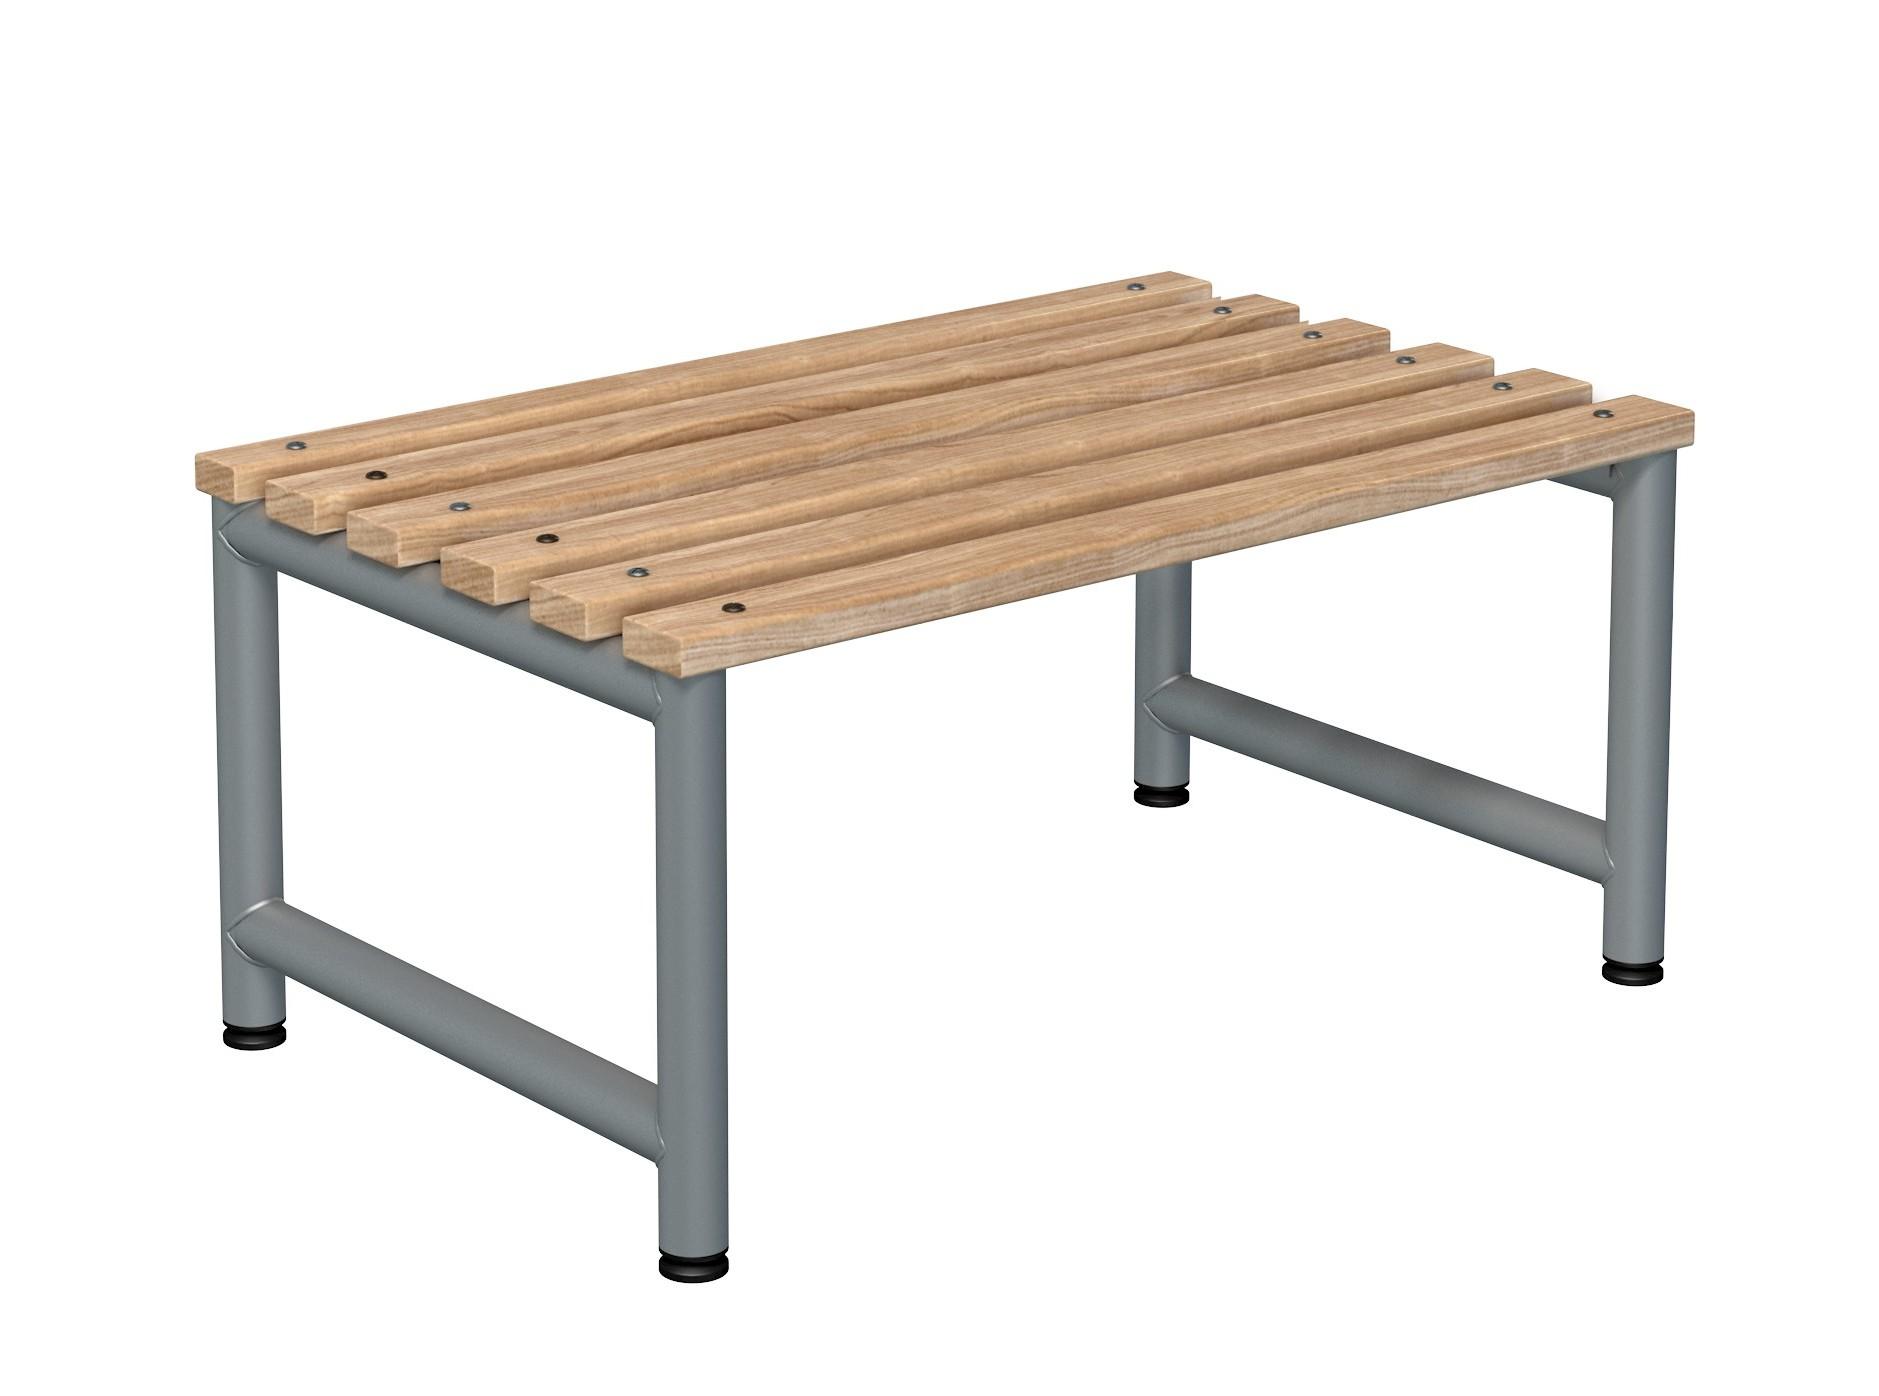 Double Sided Bench Type B - Senior